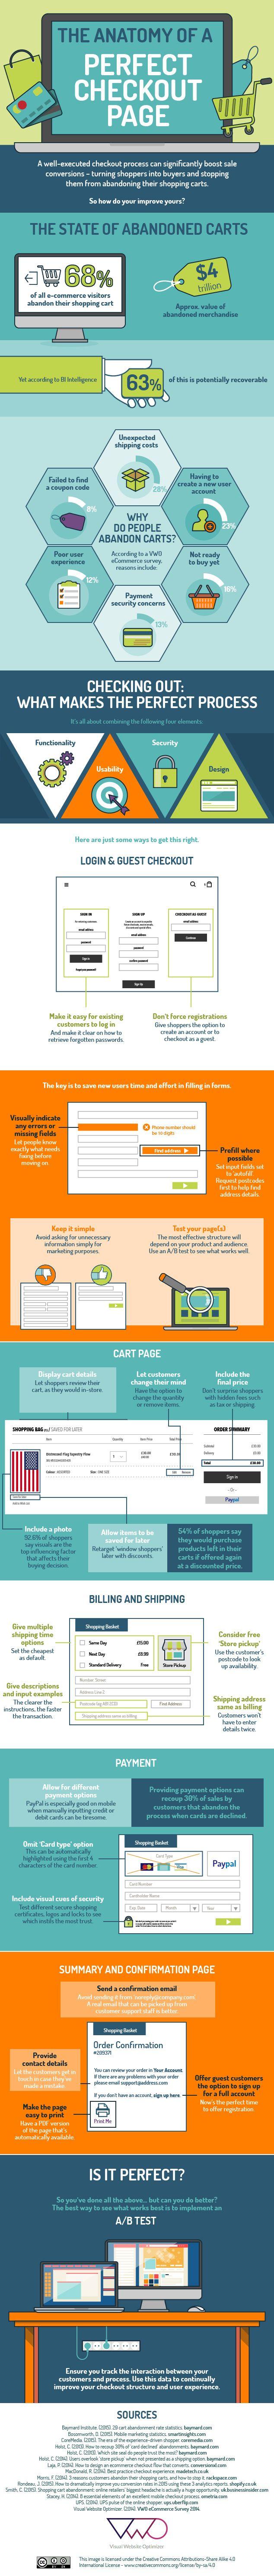 196 best Magento & e-commerce images on Pinterest   Info graphics ...